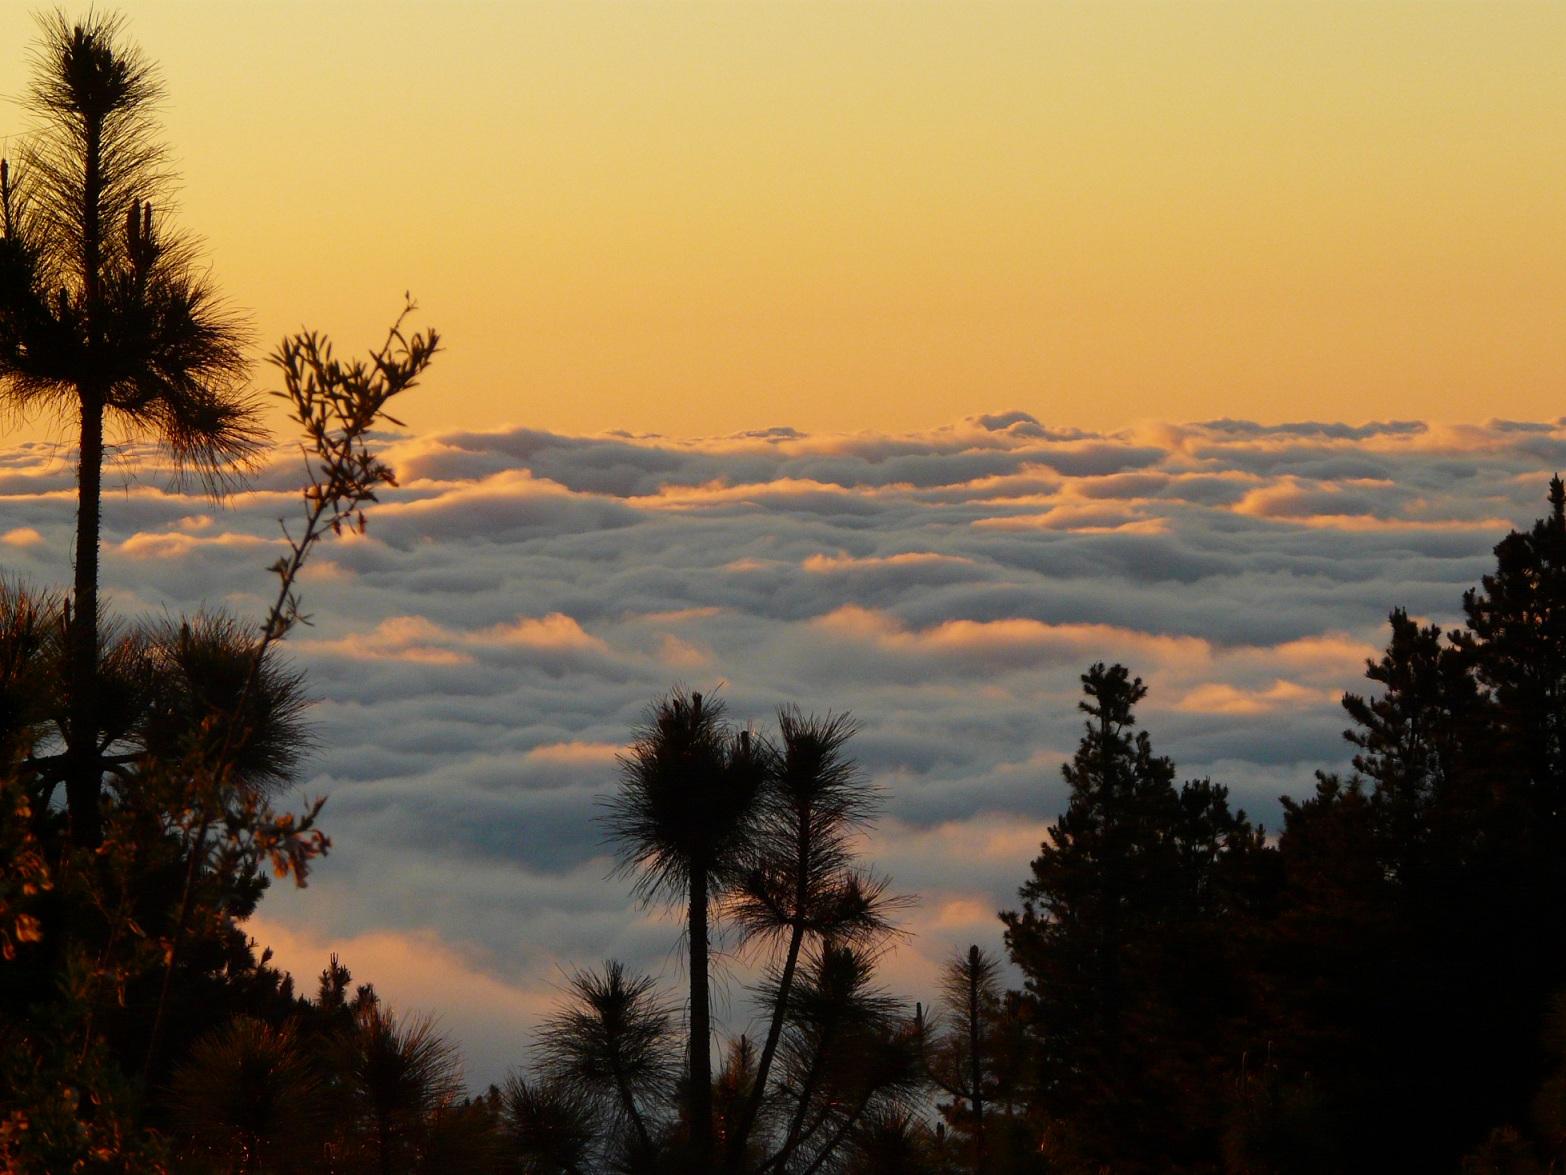 Tenerife mer de nuages